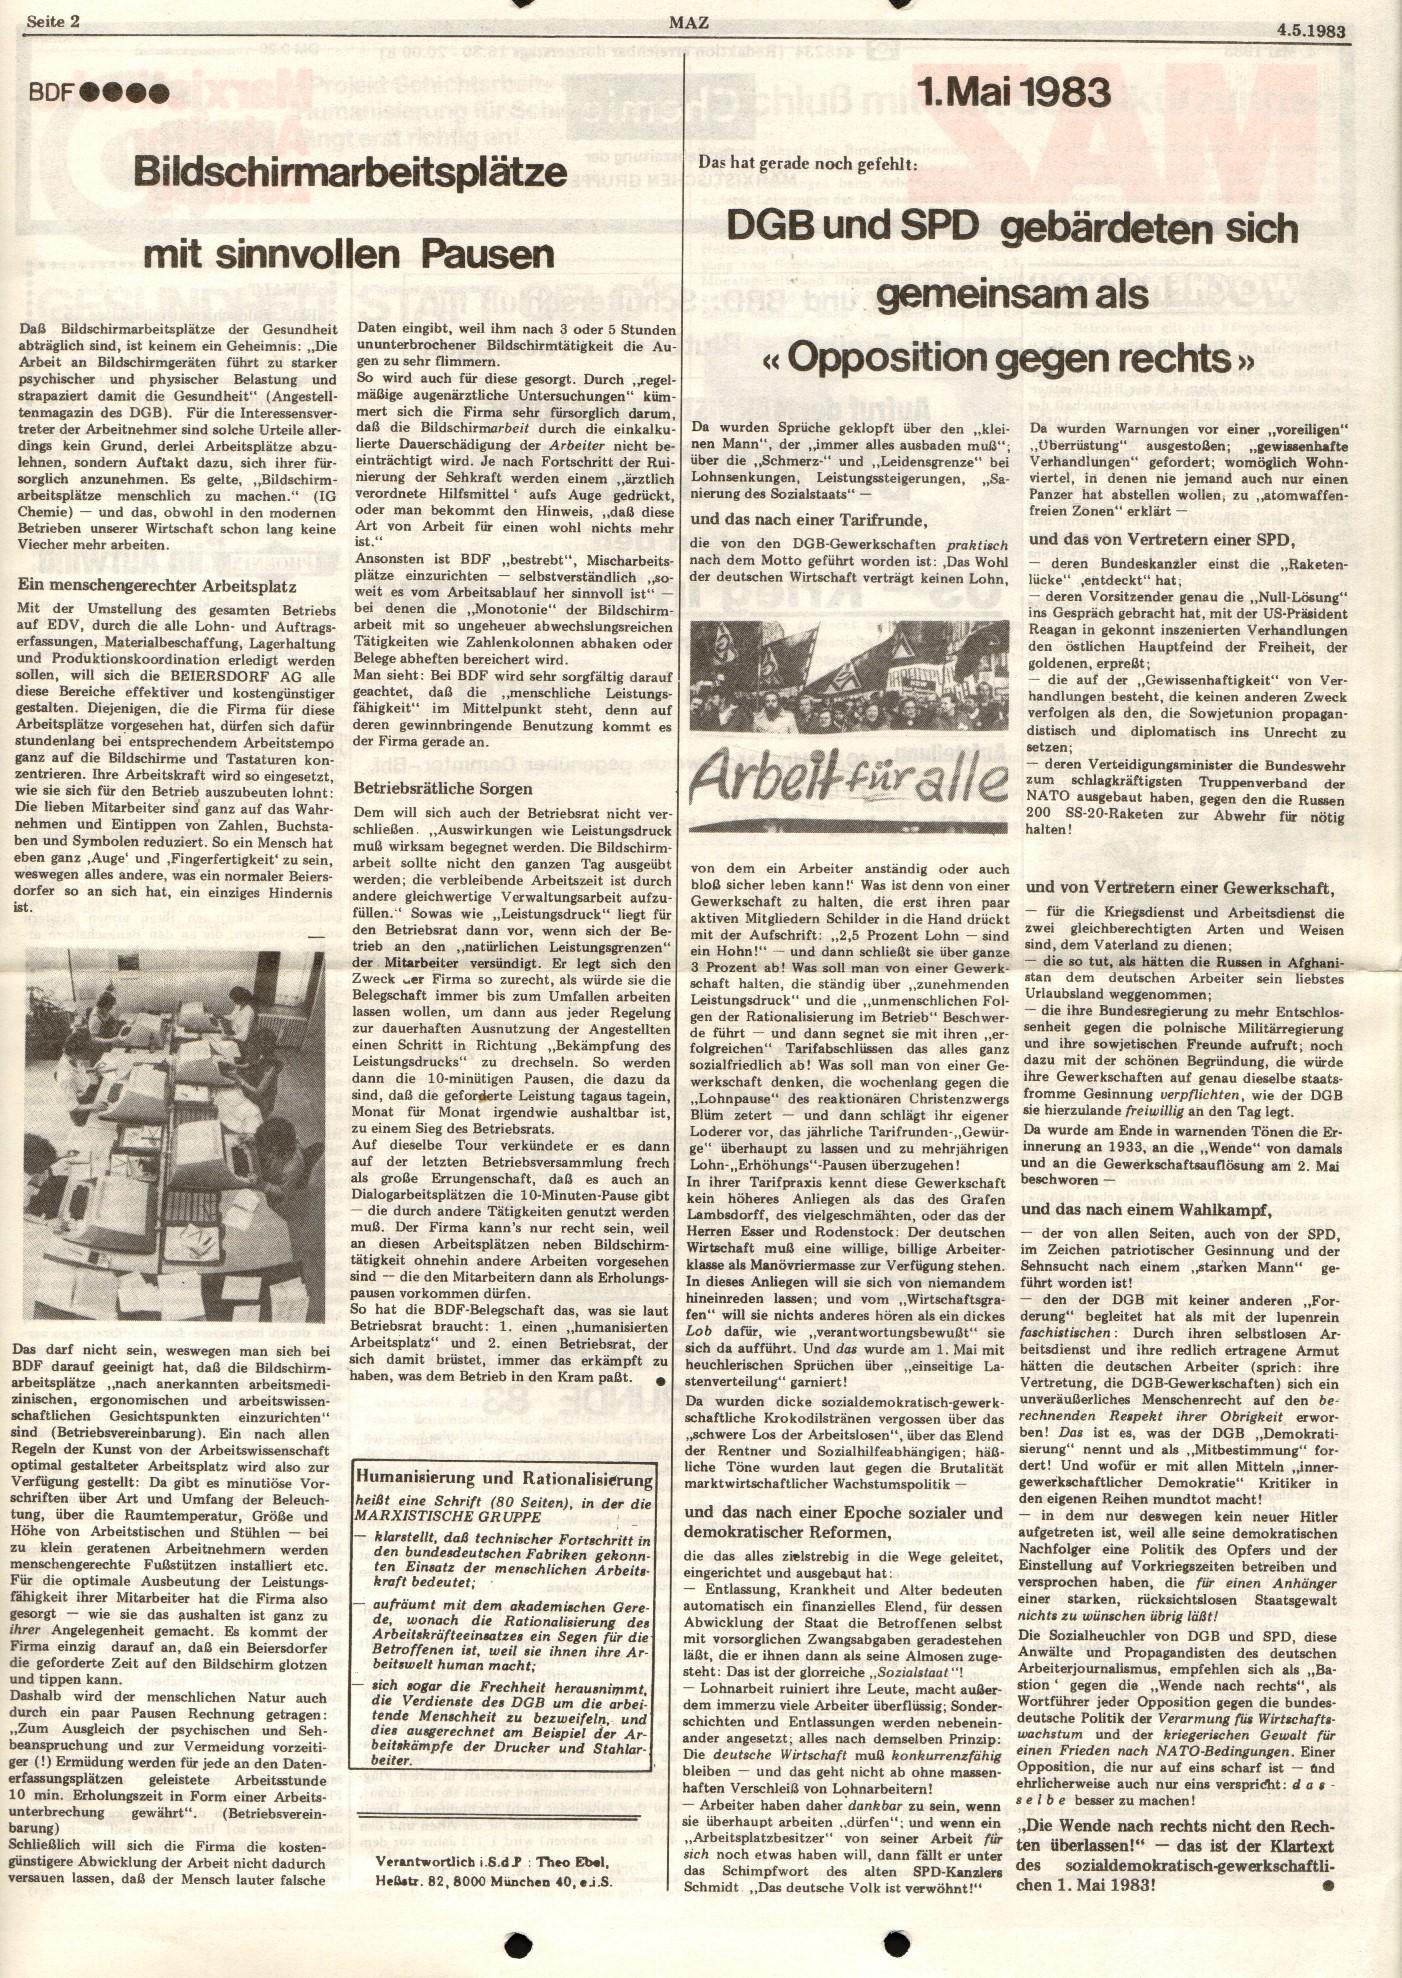 Hamburg_MG_MAZ_Chemie_19830504_02